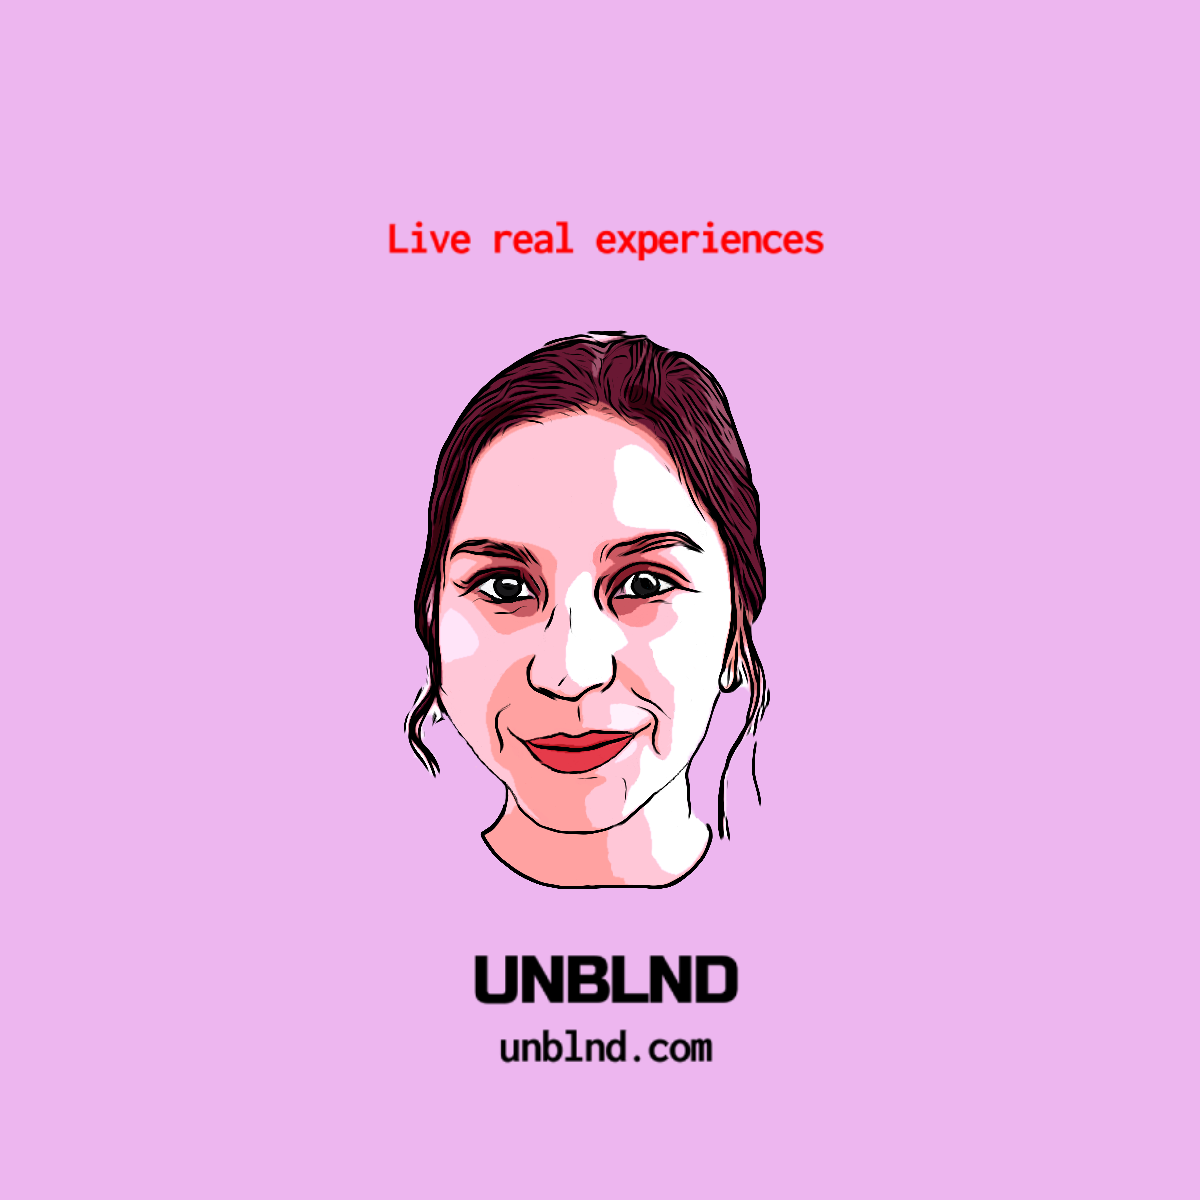 Ambassador Iara - Make new friends   UNBLND